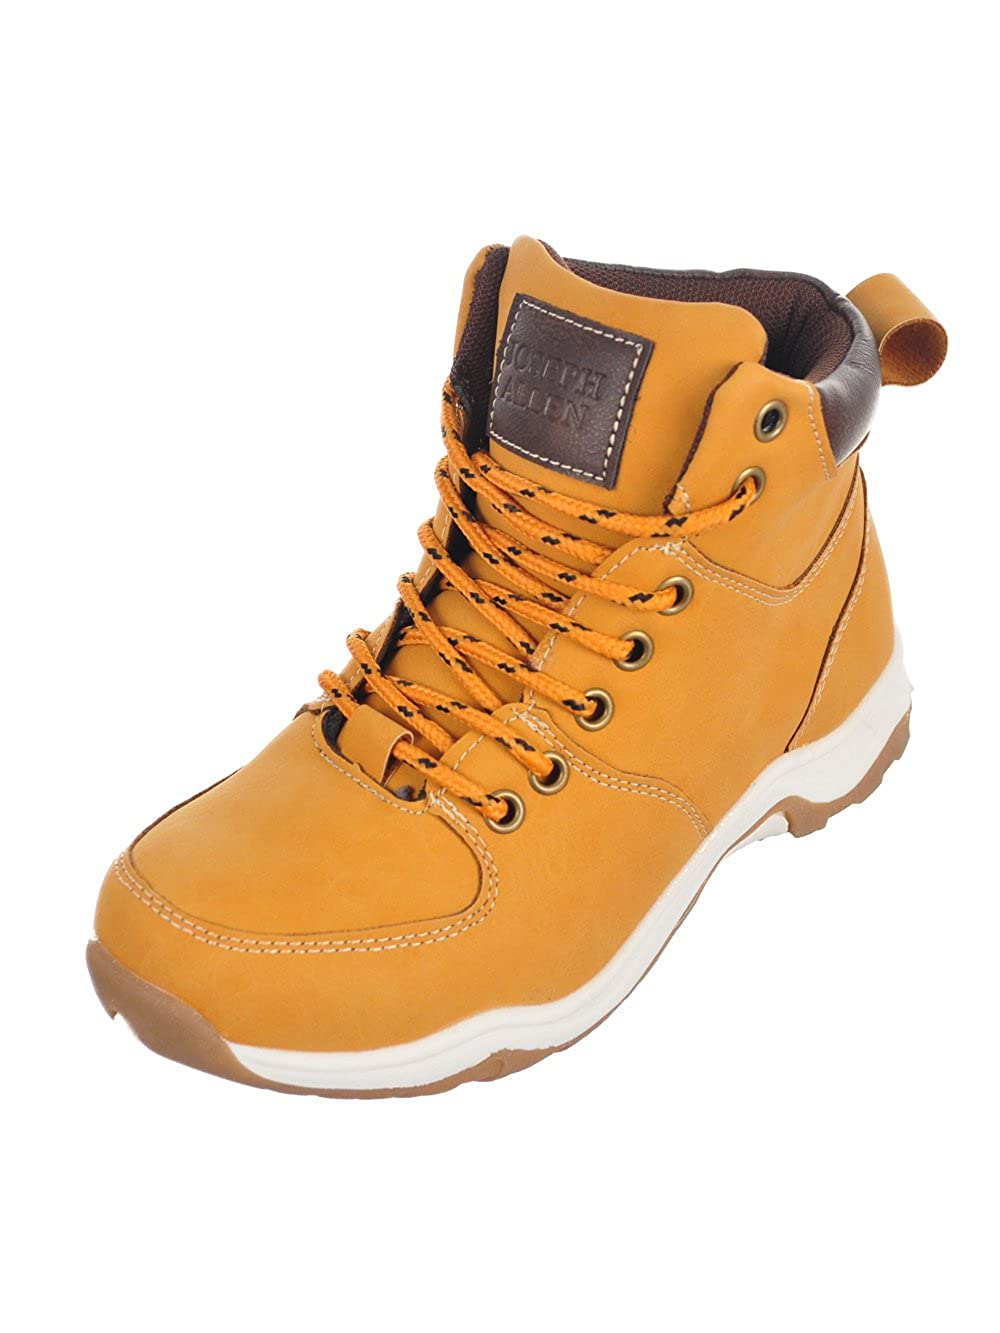 tan Joseph Allen Boys Boots 3 Youth